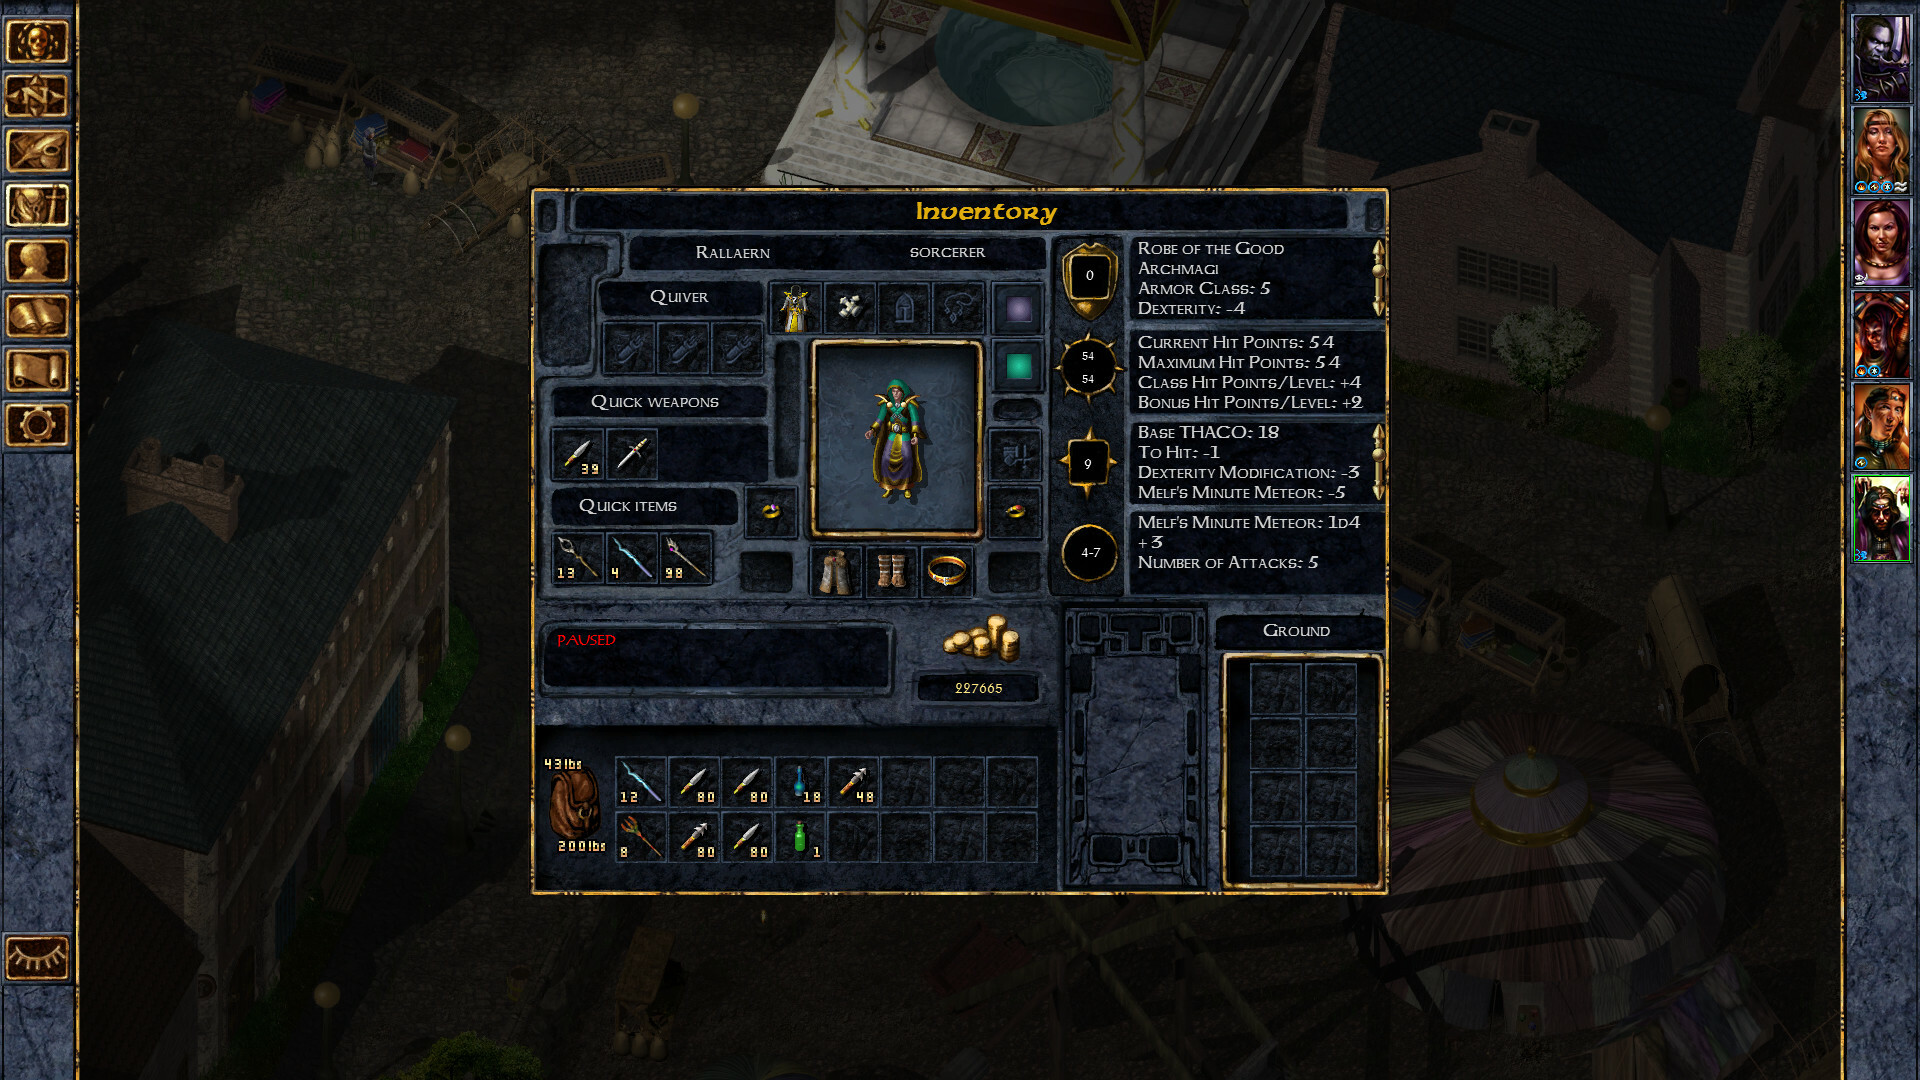 baldurs-gate-enhanced-edition-pc-screenshot-3